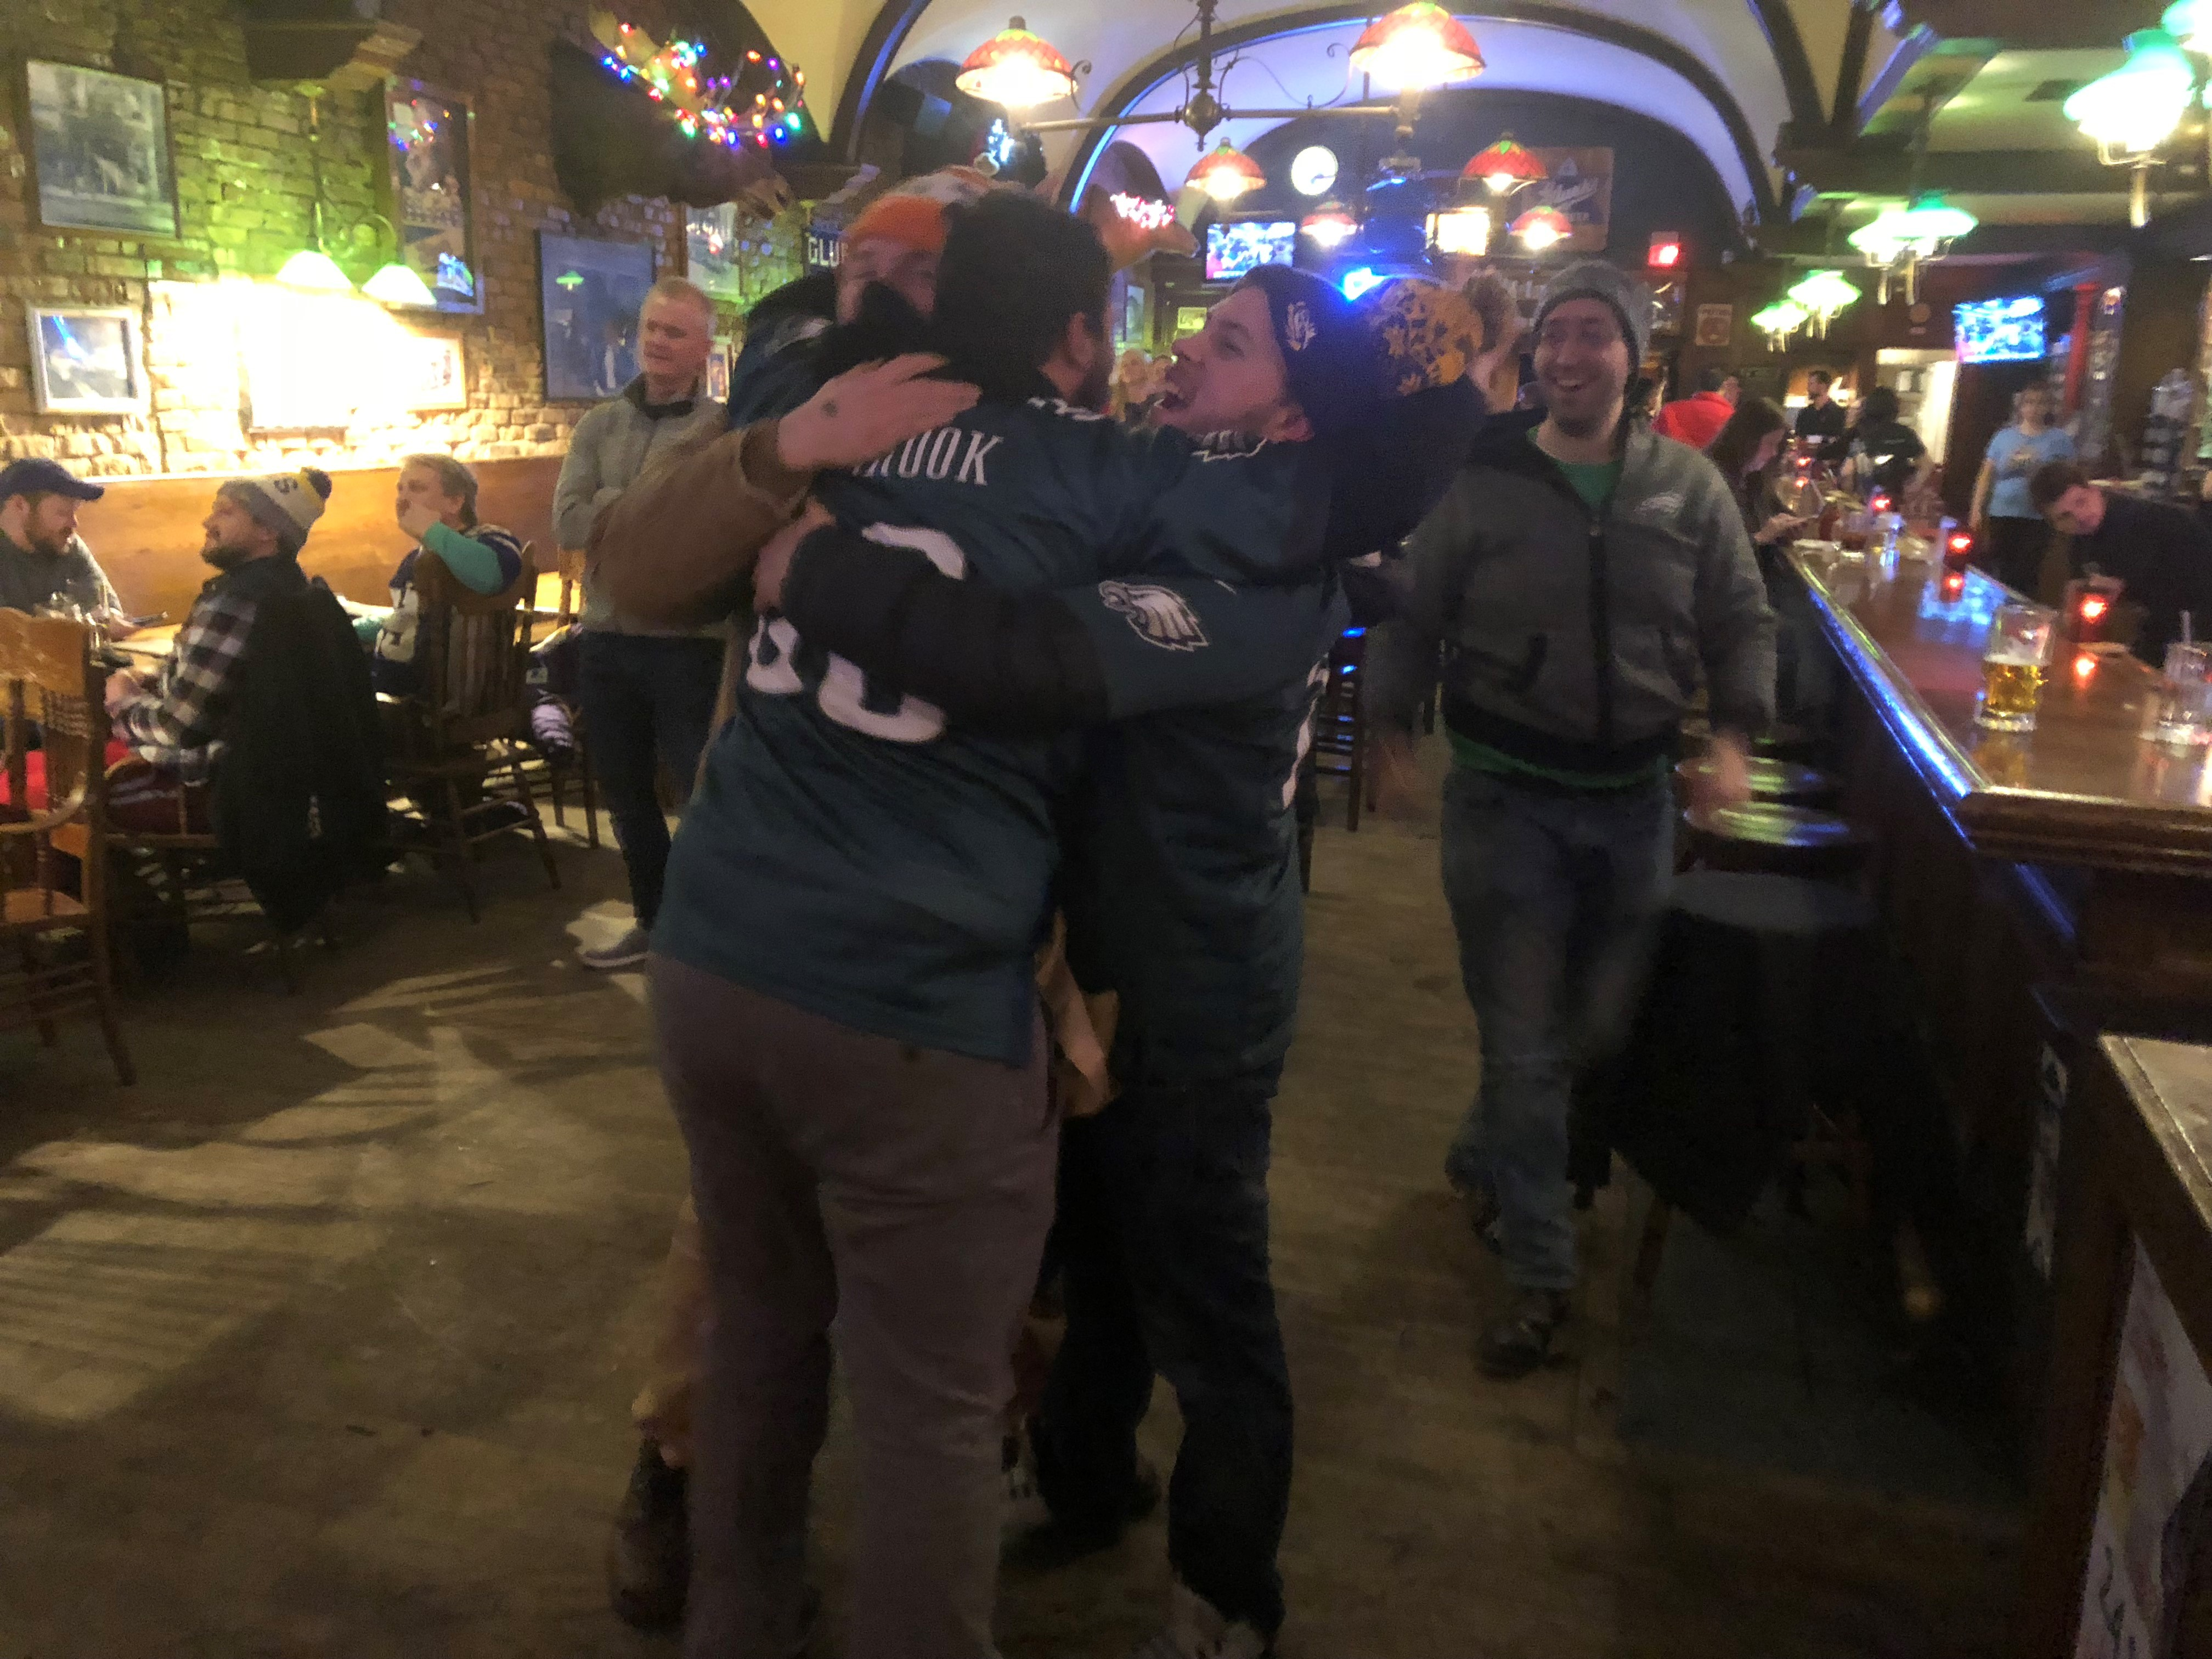 Joy in Minneapolis! At a bar blocks from the stadium, Eagles fan Chris Jordan (right), celebrates a Super Bowl victory.